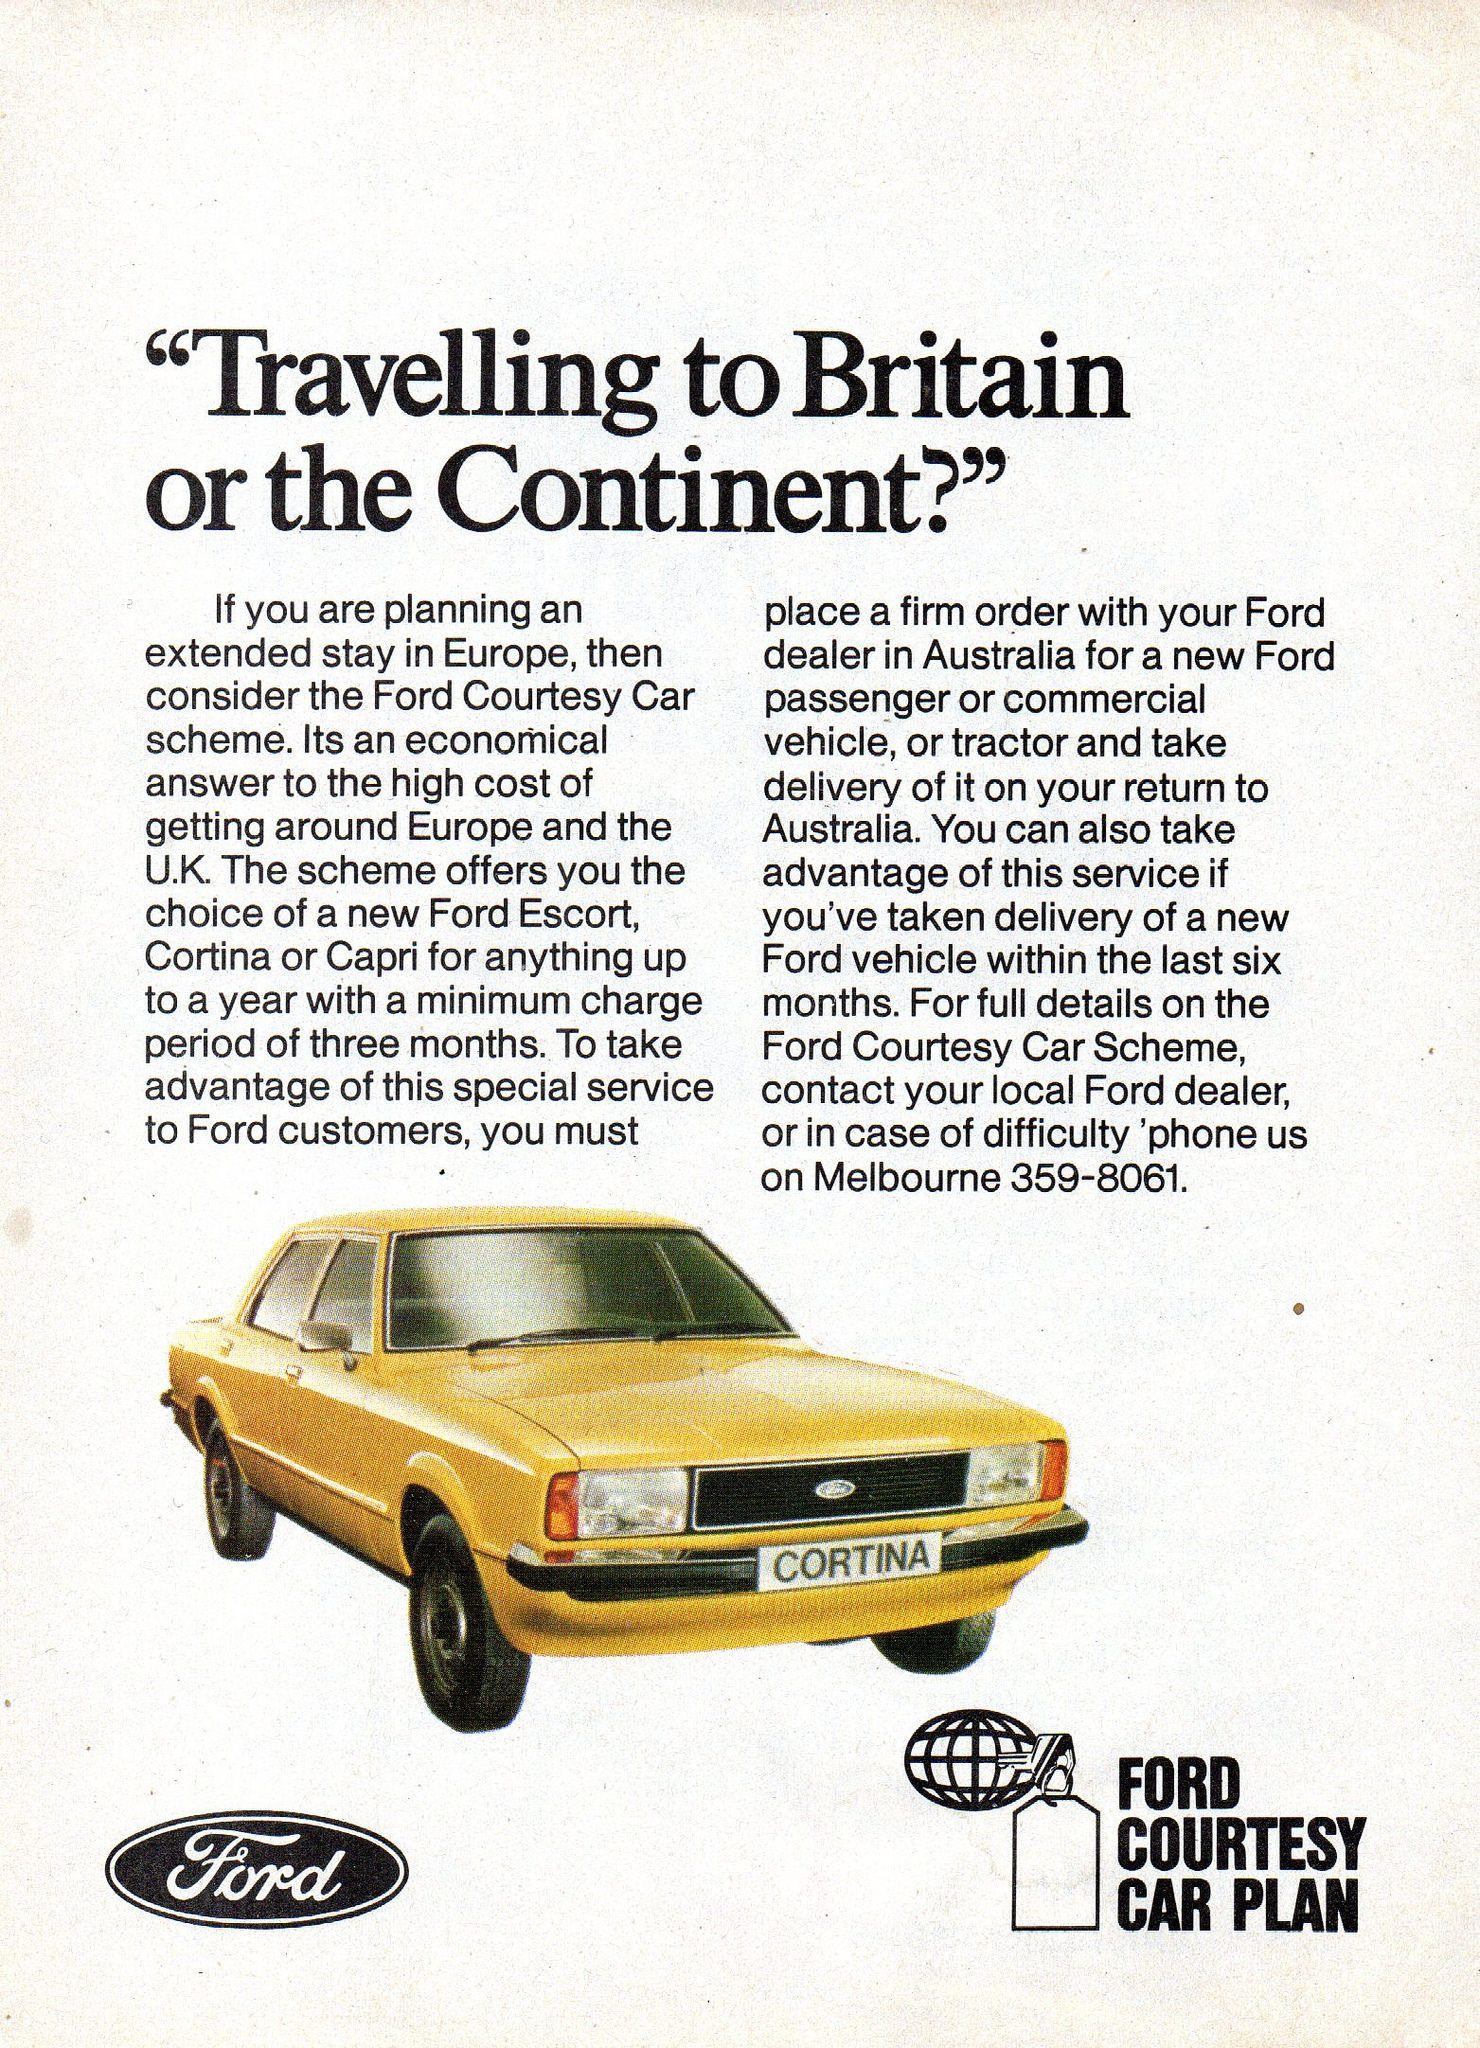 1978 Ford Courtesy Plan Te Ford Cortina Aussie Original Magazine